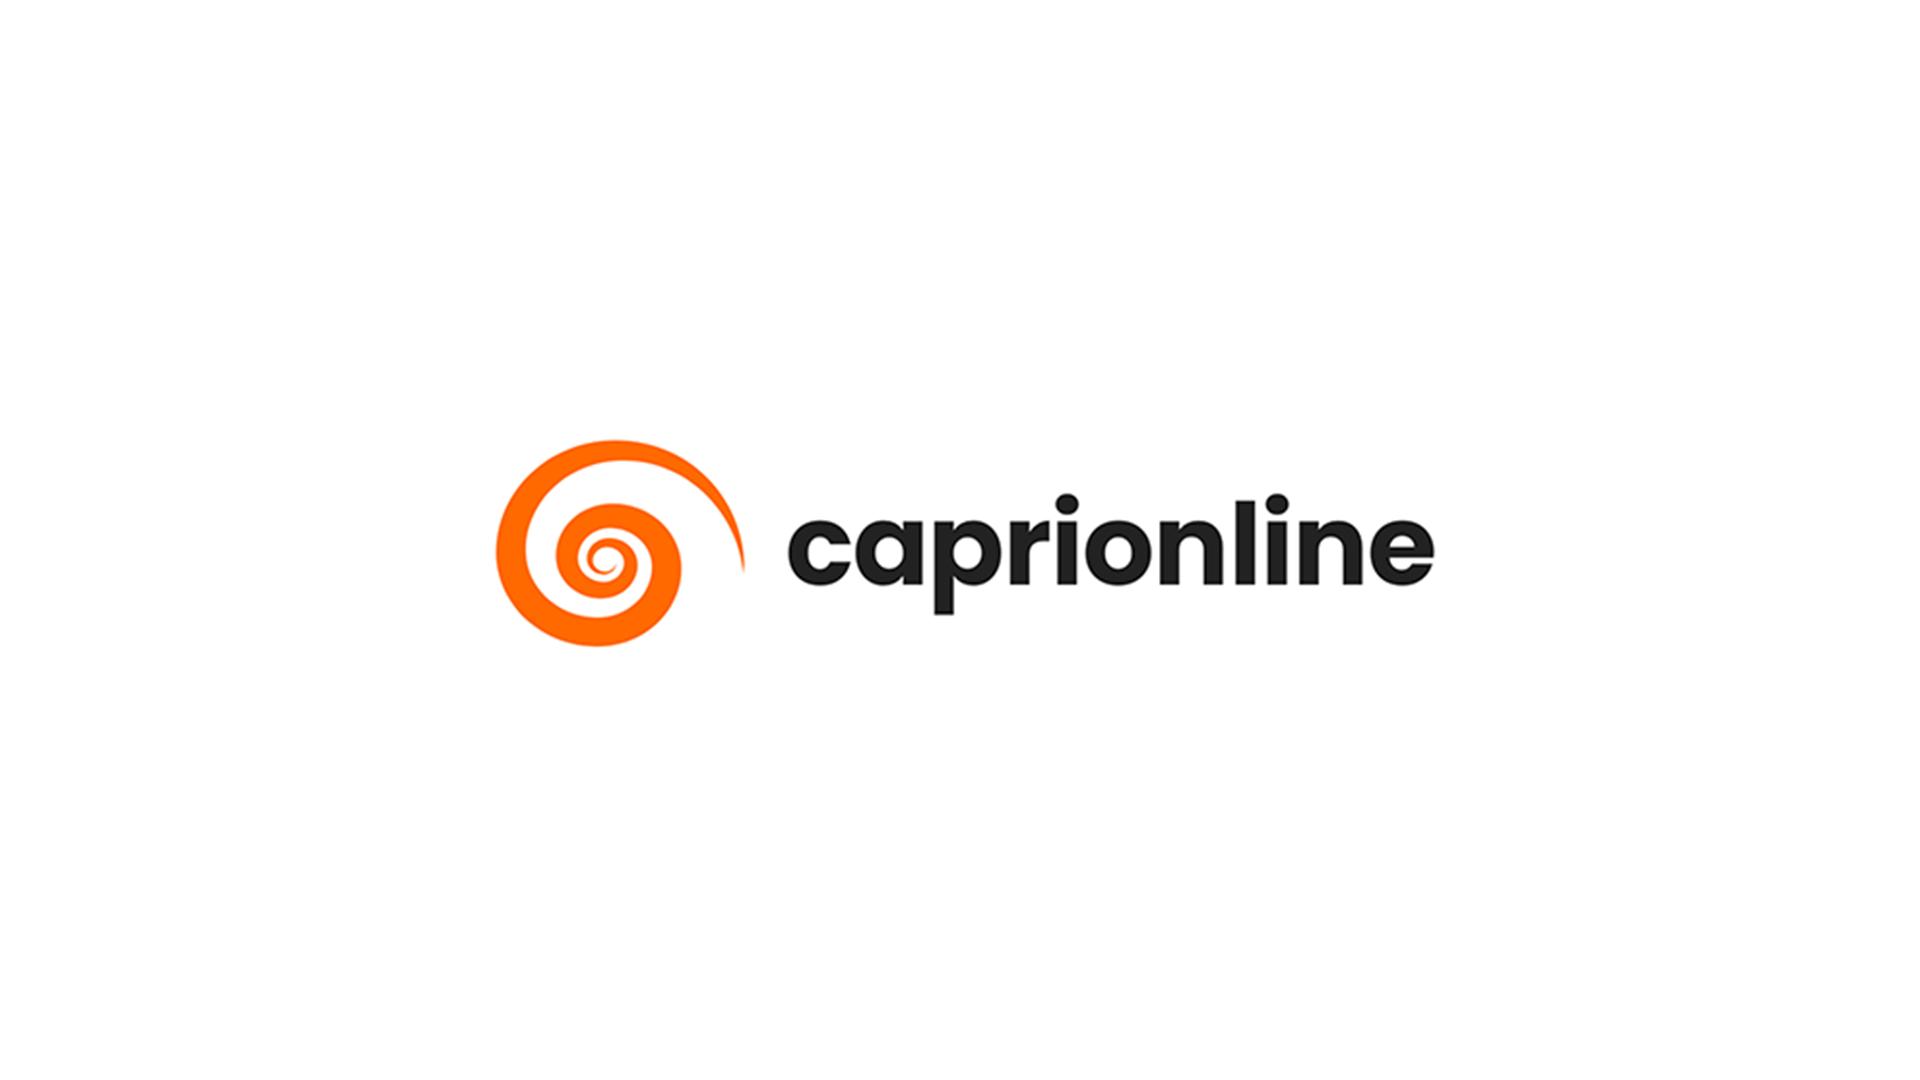 Caprionline